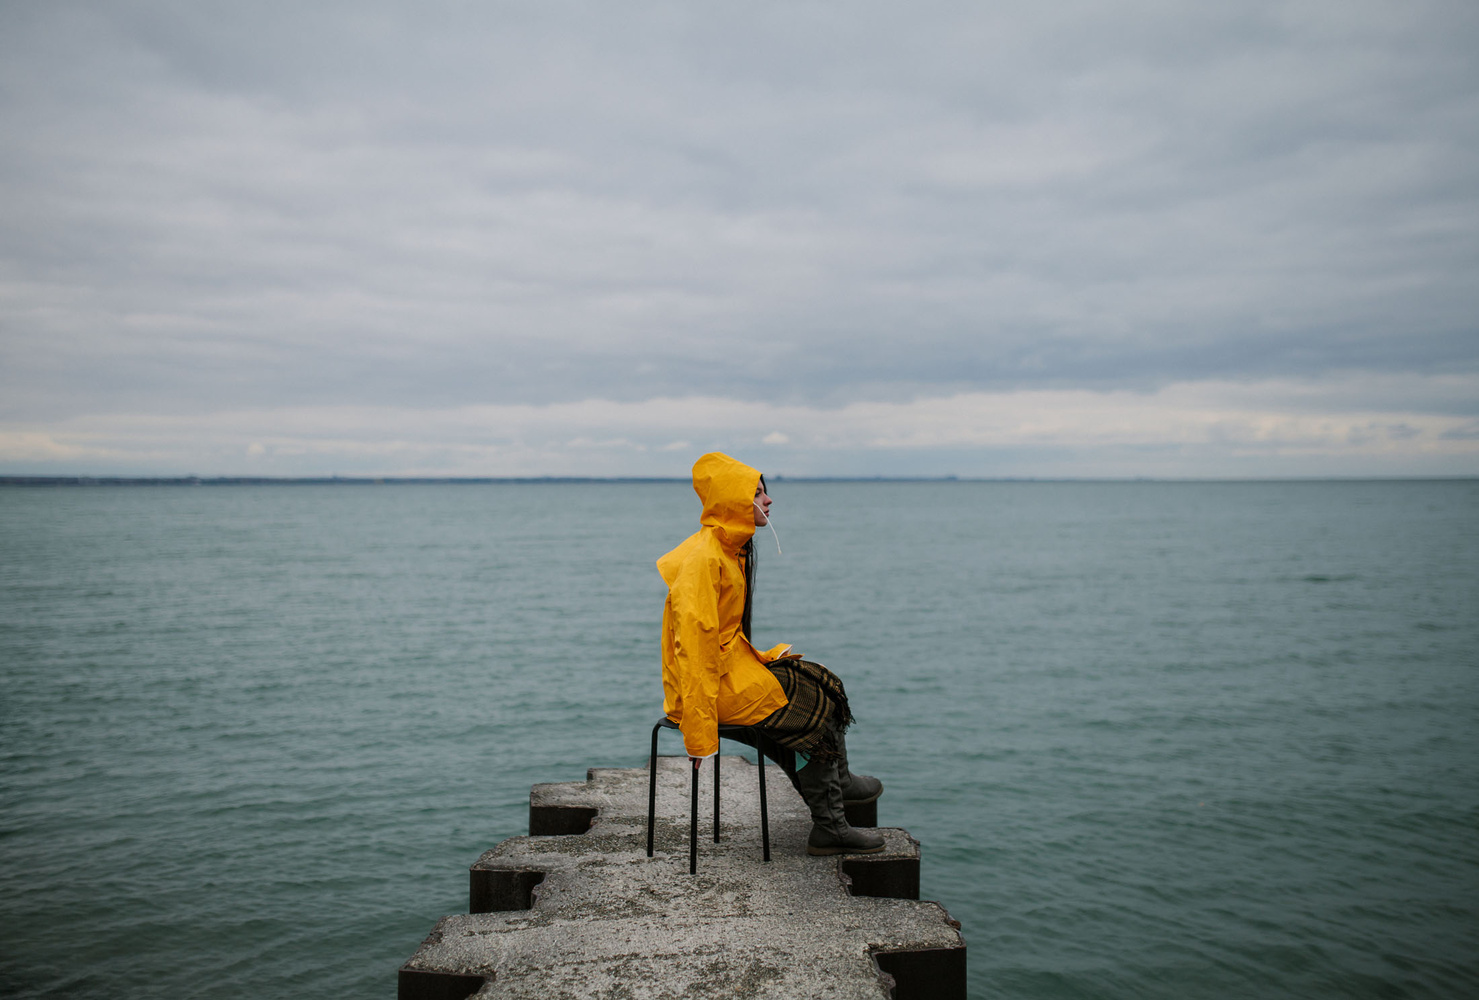 Little yellow Riding Hood by Ian Pettigrew